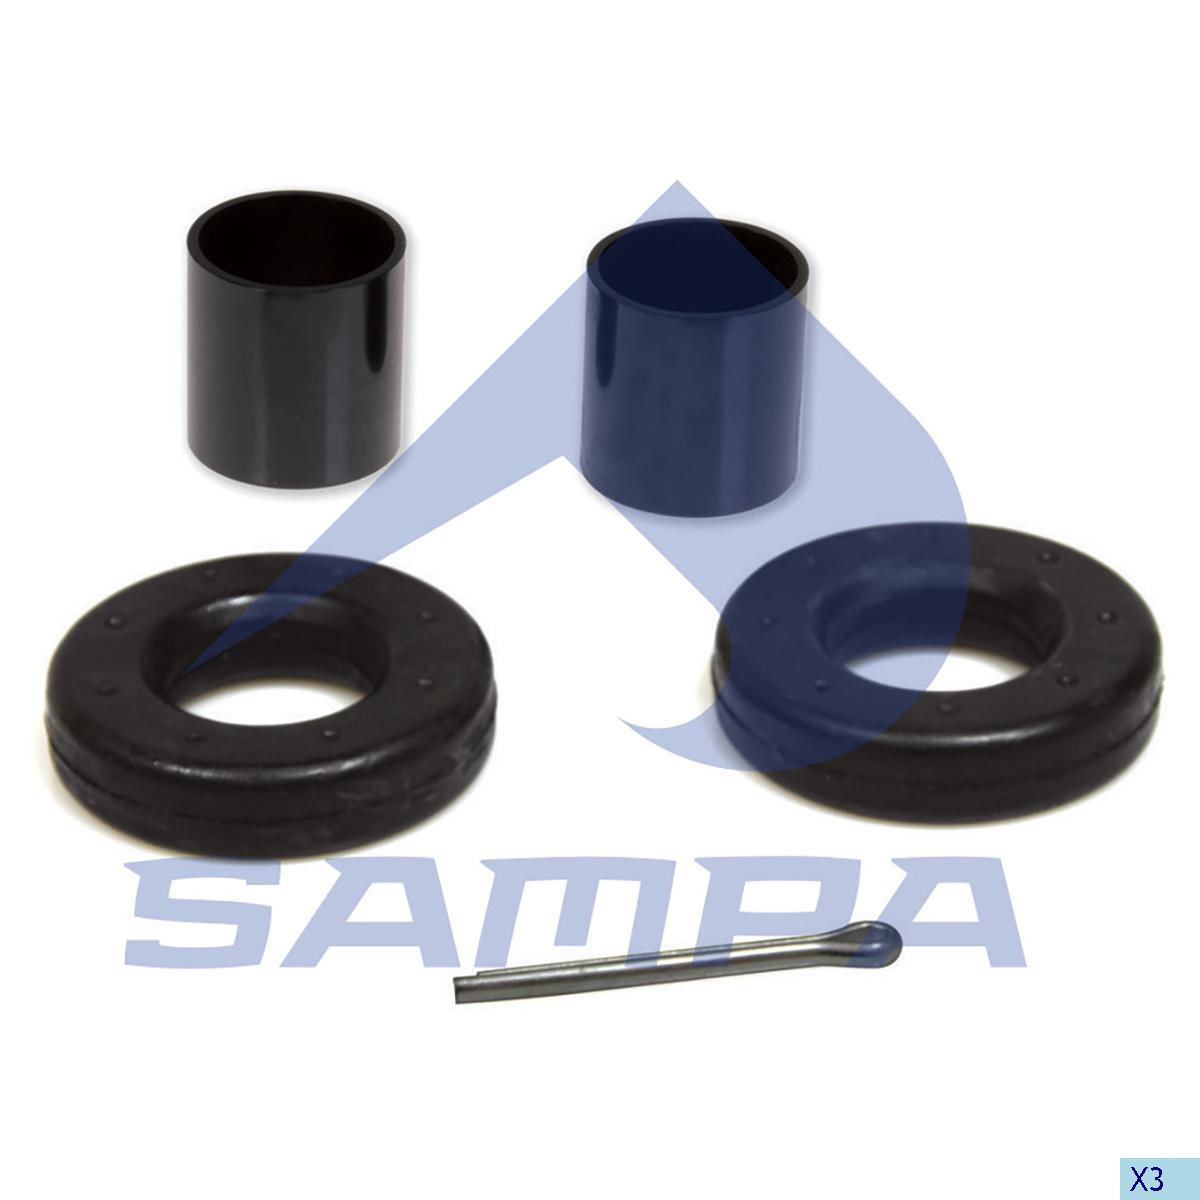 Repair Kit, Trailer Coupling, Complementary Equipment